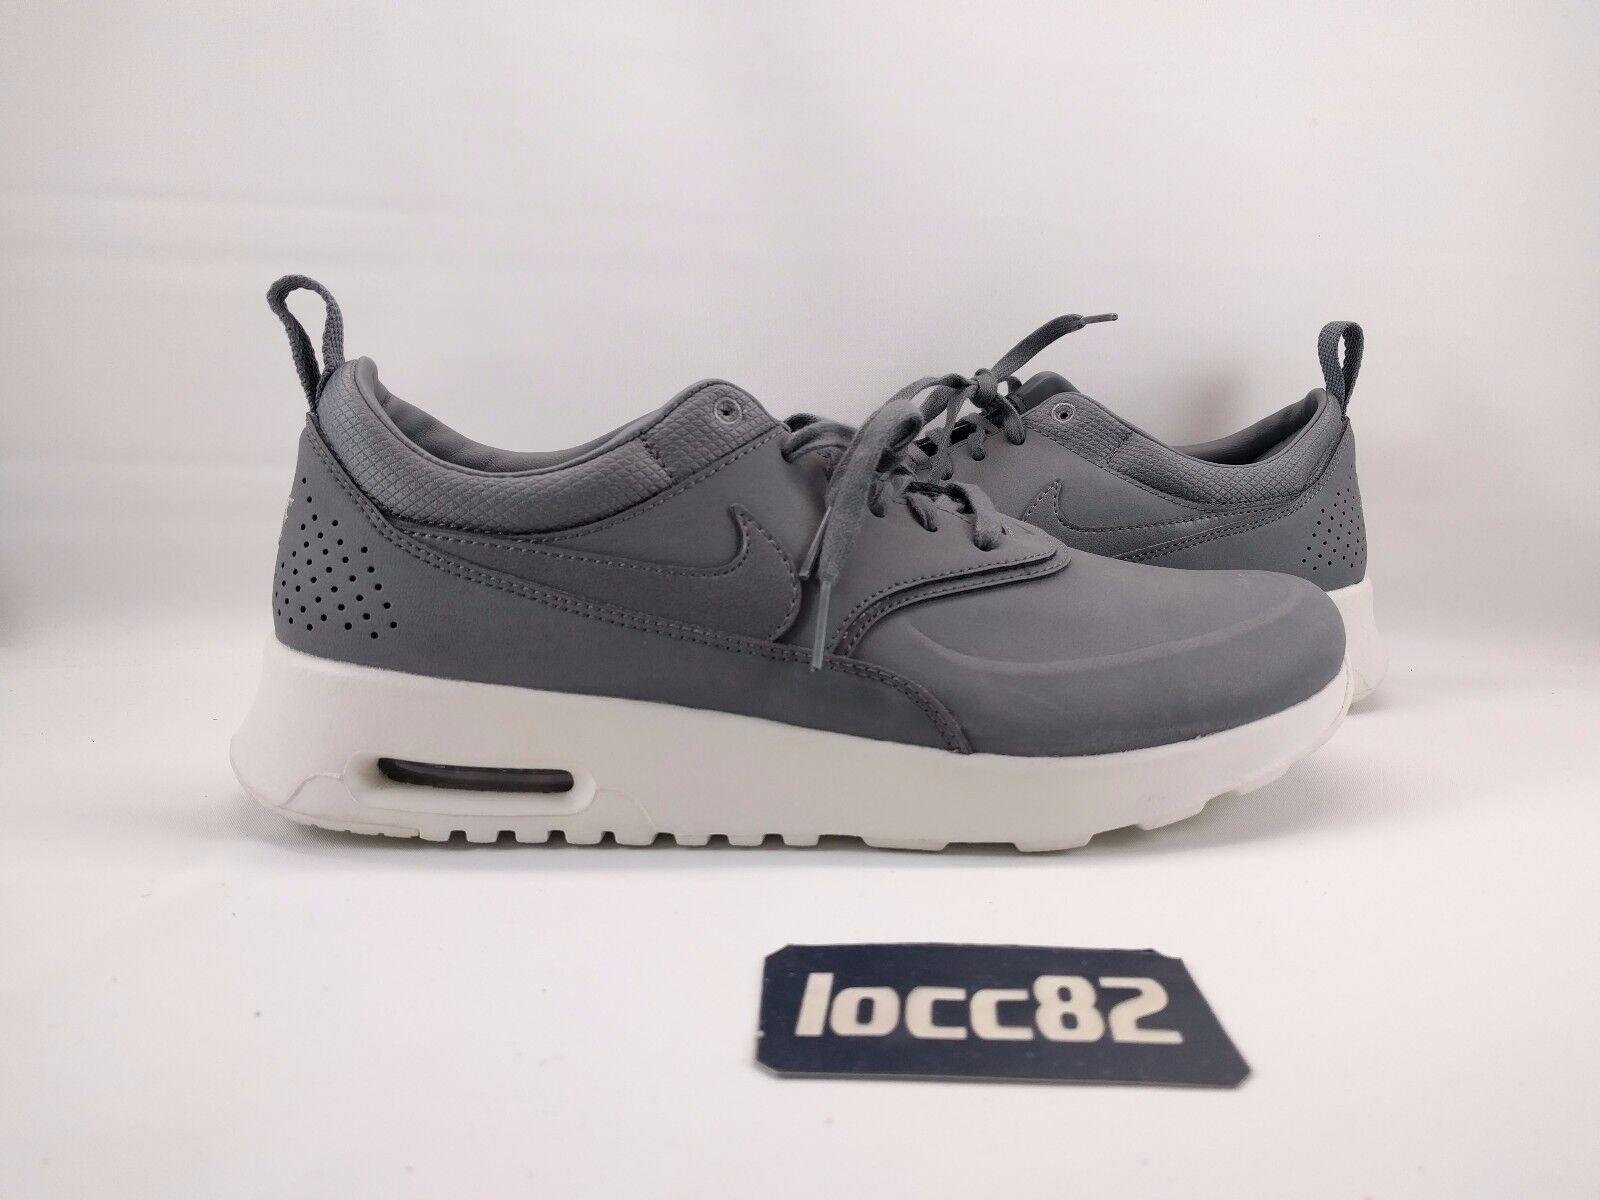 Nike Women's Air Max Thea sz 9.5 [616723 008] cool grey gray PRM one 90